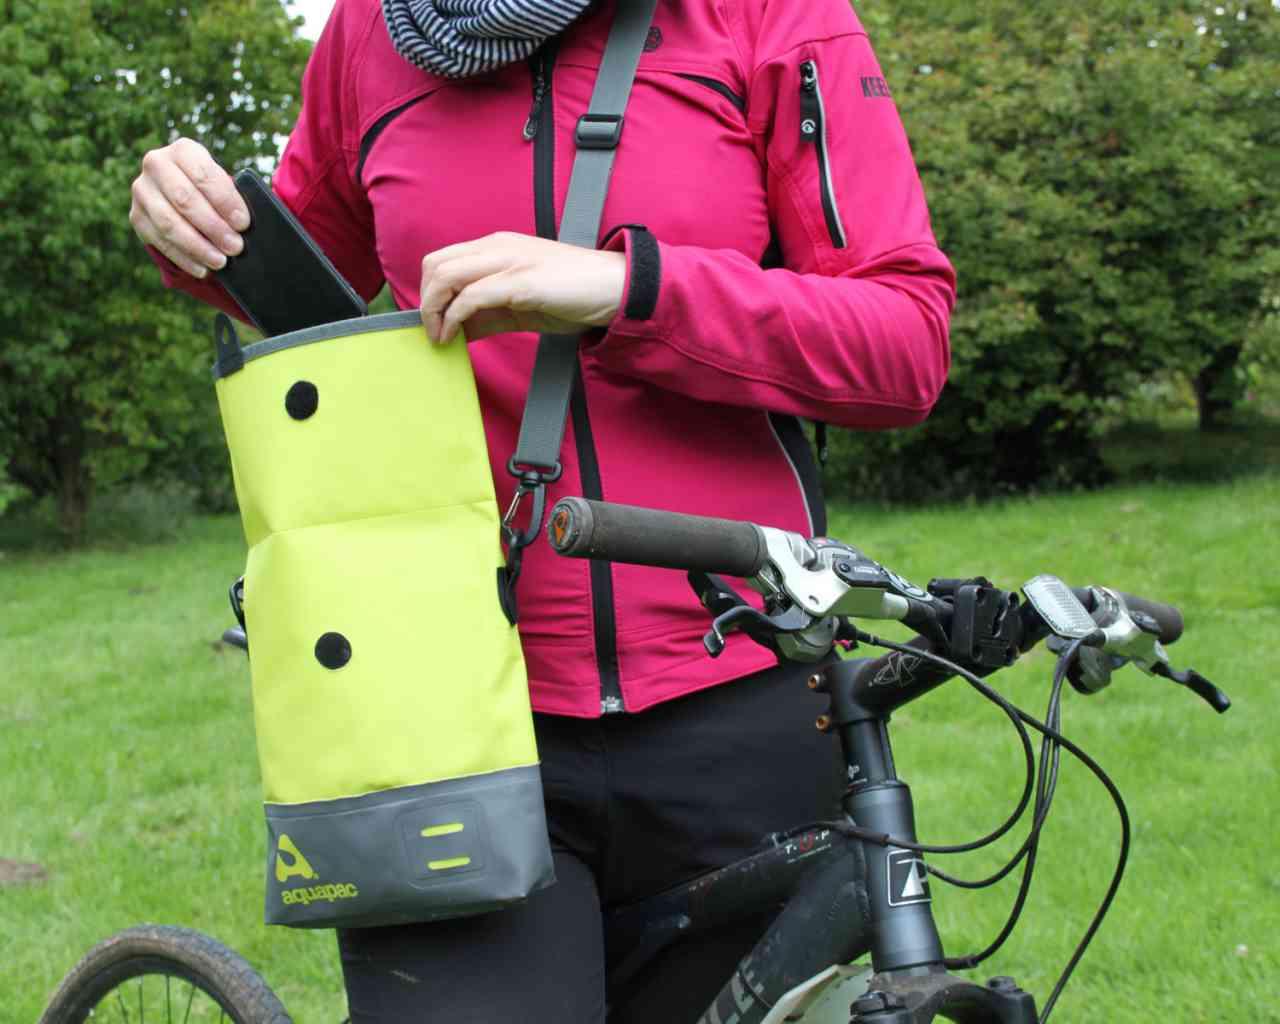 Брызгозащитная сумка Aquapac 051 - TrailProof™ Tote Bag – Small.. Aquapac - №1 в мире водонепроницаемых чехлов и сумок. Фото 3